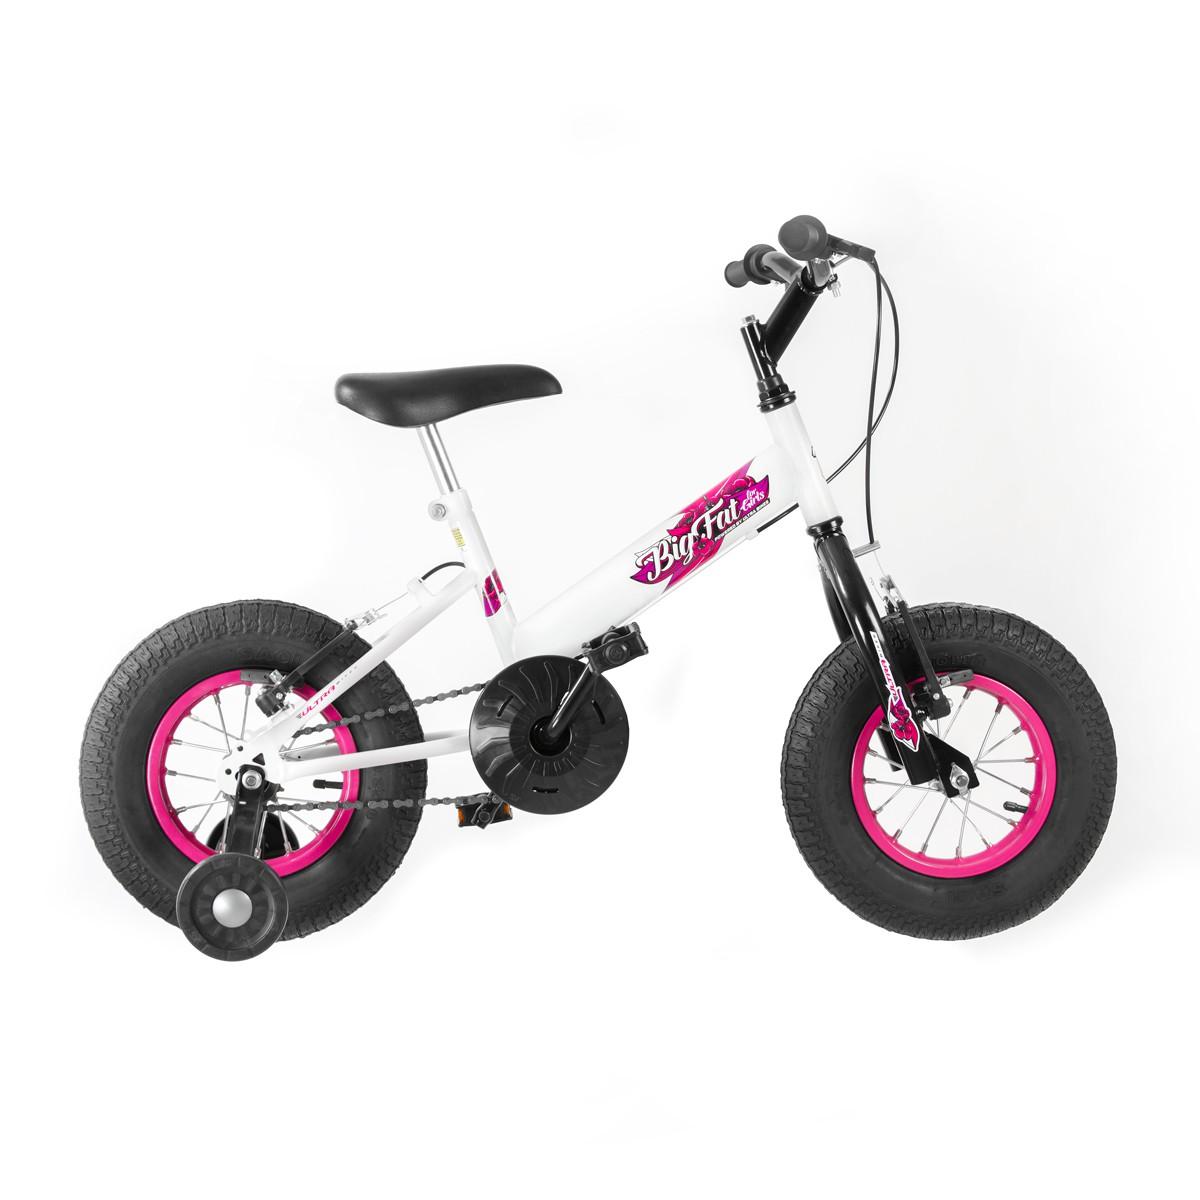 Bicicleta Infantil Feminina Ultra Bikes Big Fat Aro 16 Com Rodinhas - Pro Tork